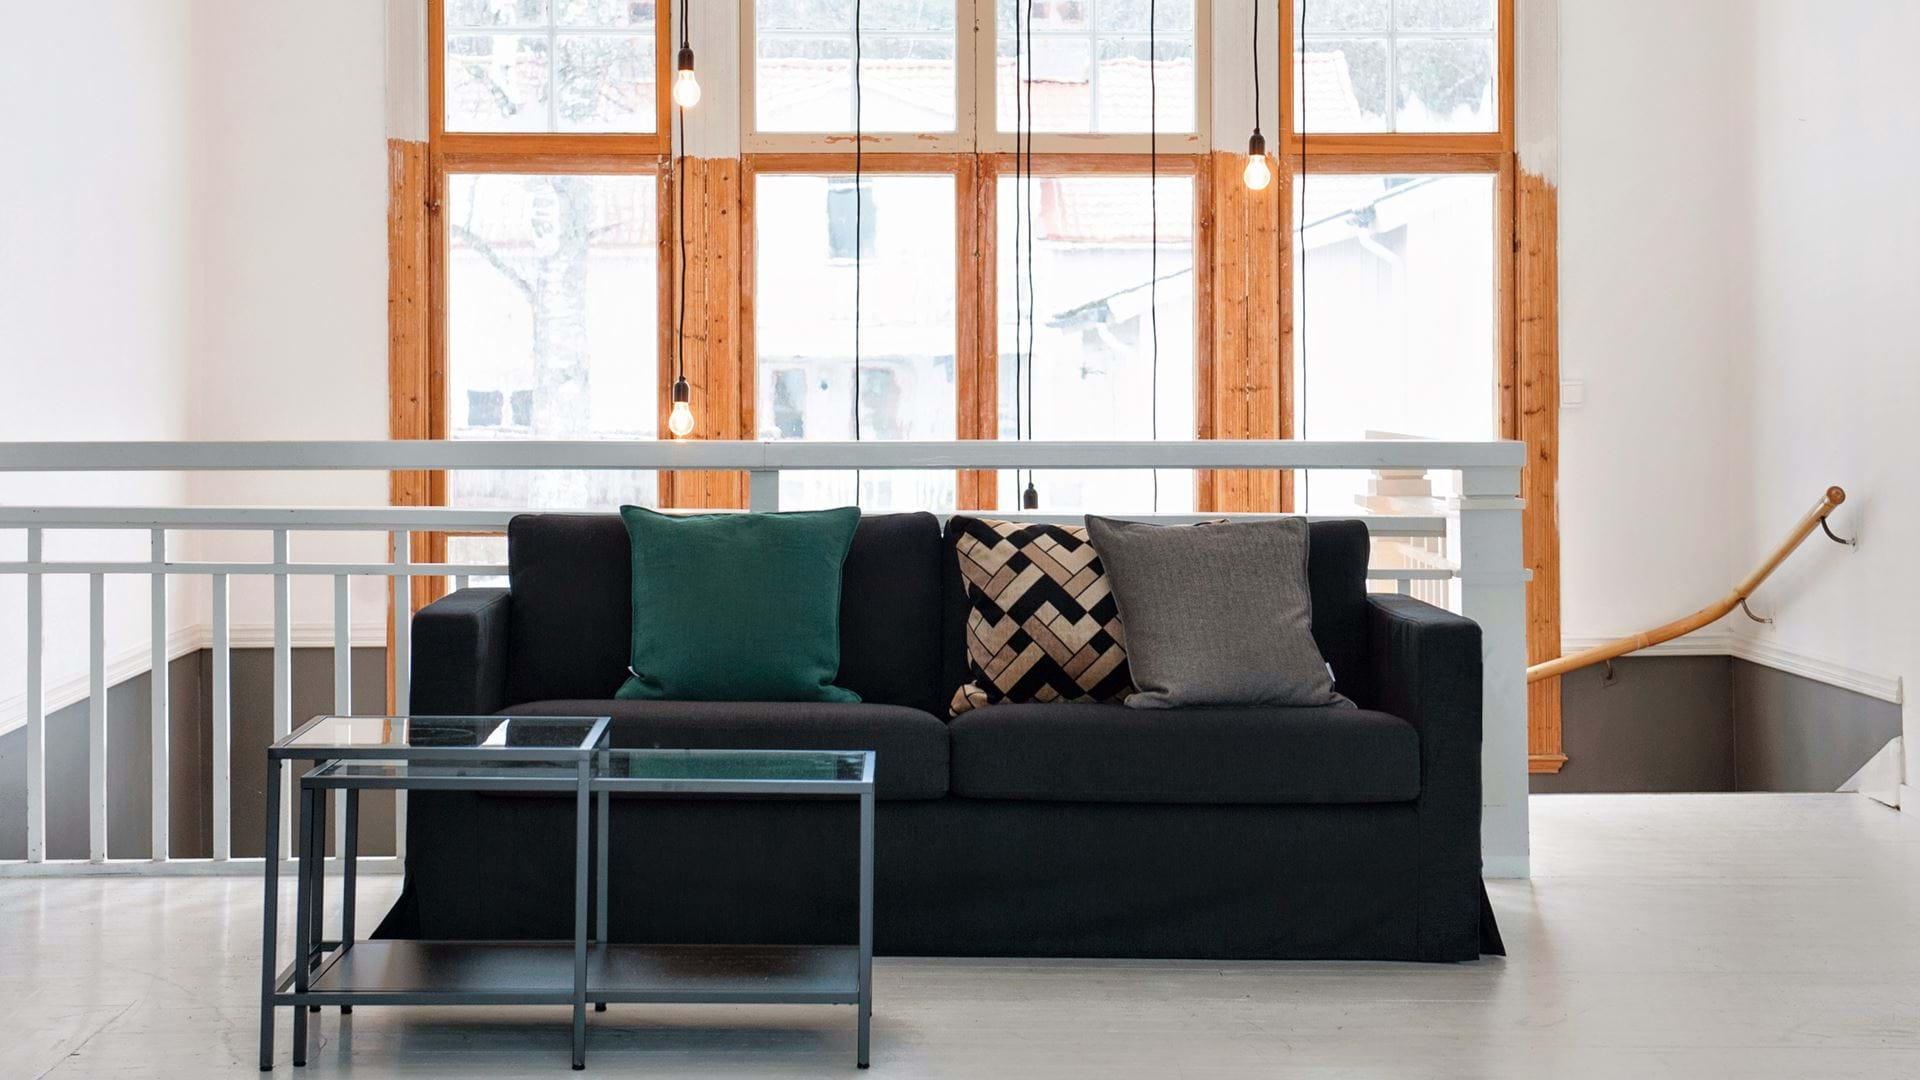 Enjoyable Ikea Karlstad 2 Seater Sofa Cover Long Skirt Bemz Bemz Unemploymentrelief Wooden Chair Designs For Living Room Unemploymentrelieforg